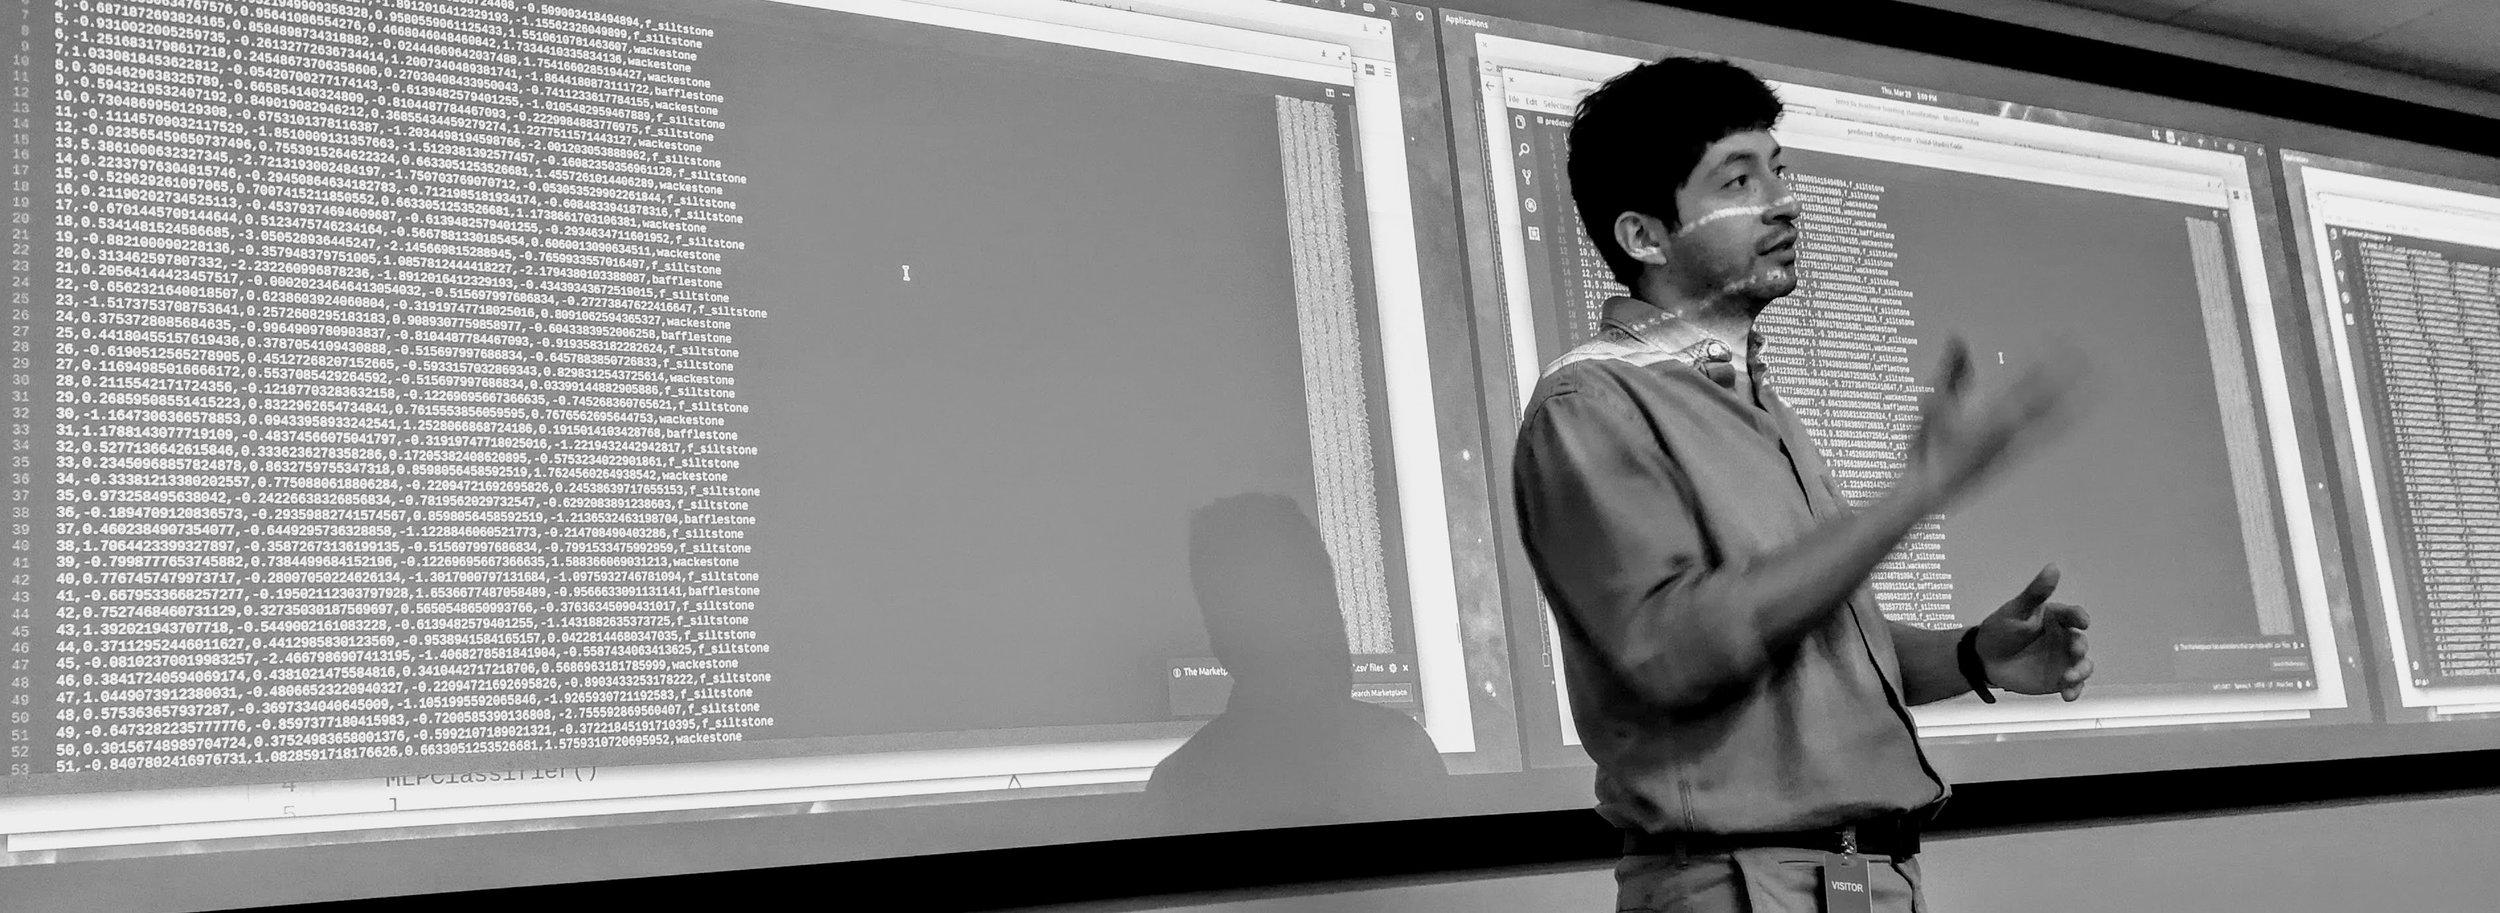 Diego teaching in Houston in 2018.